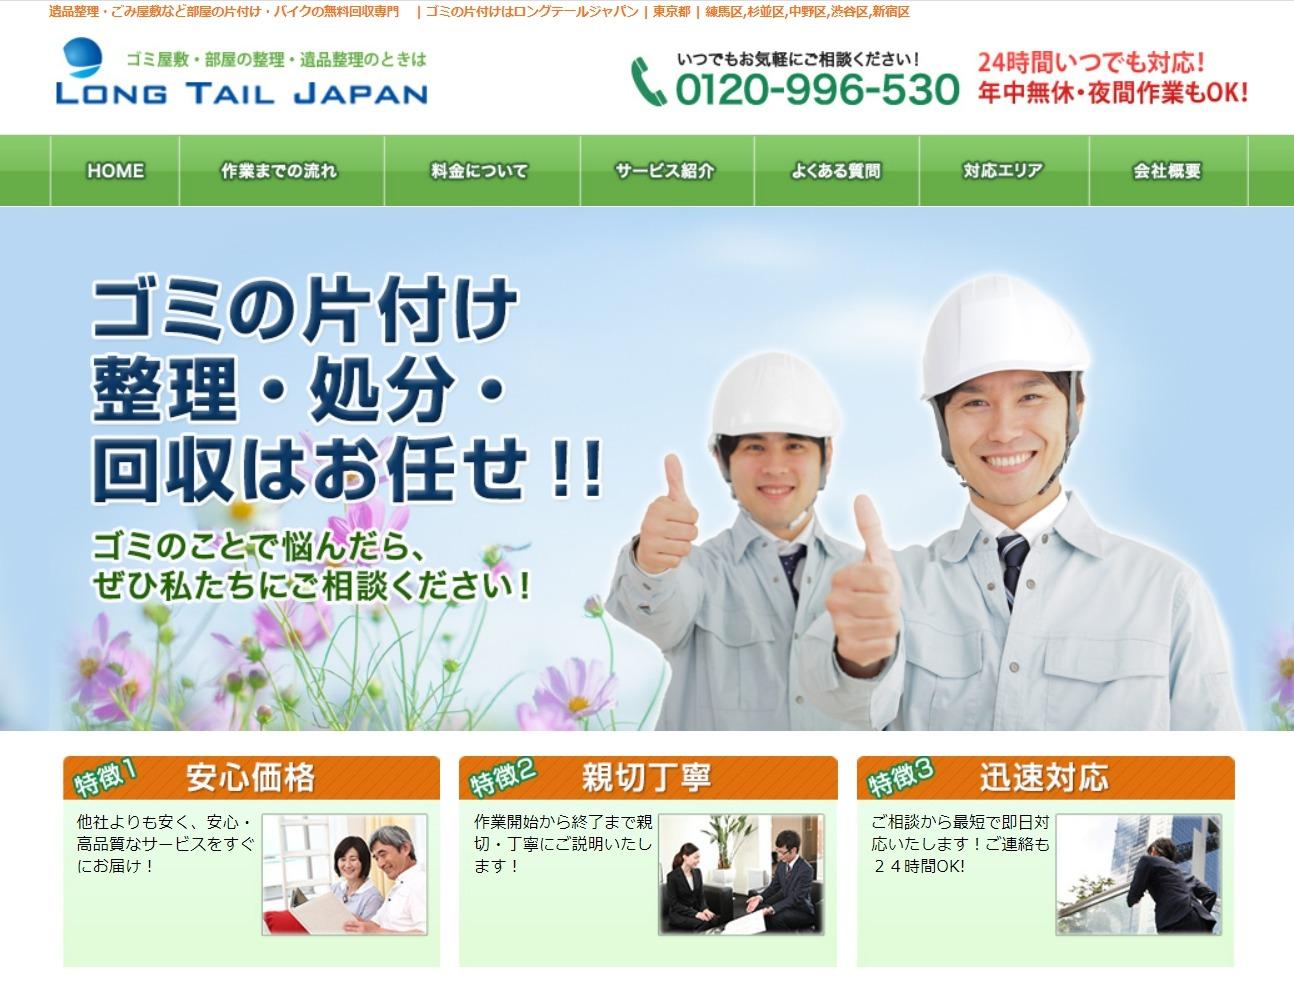 http://longtail-japan-tokyo23-west.net/